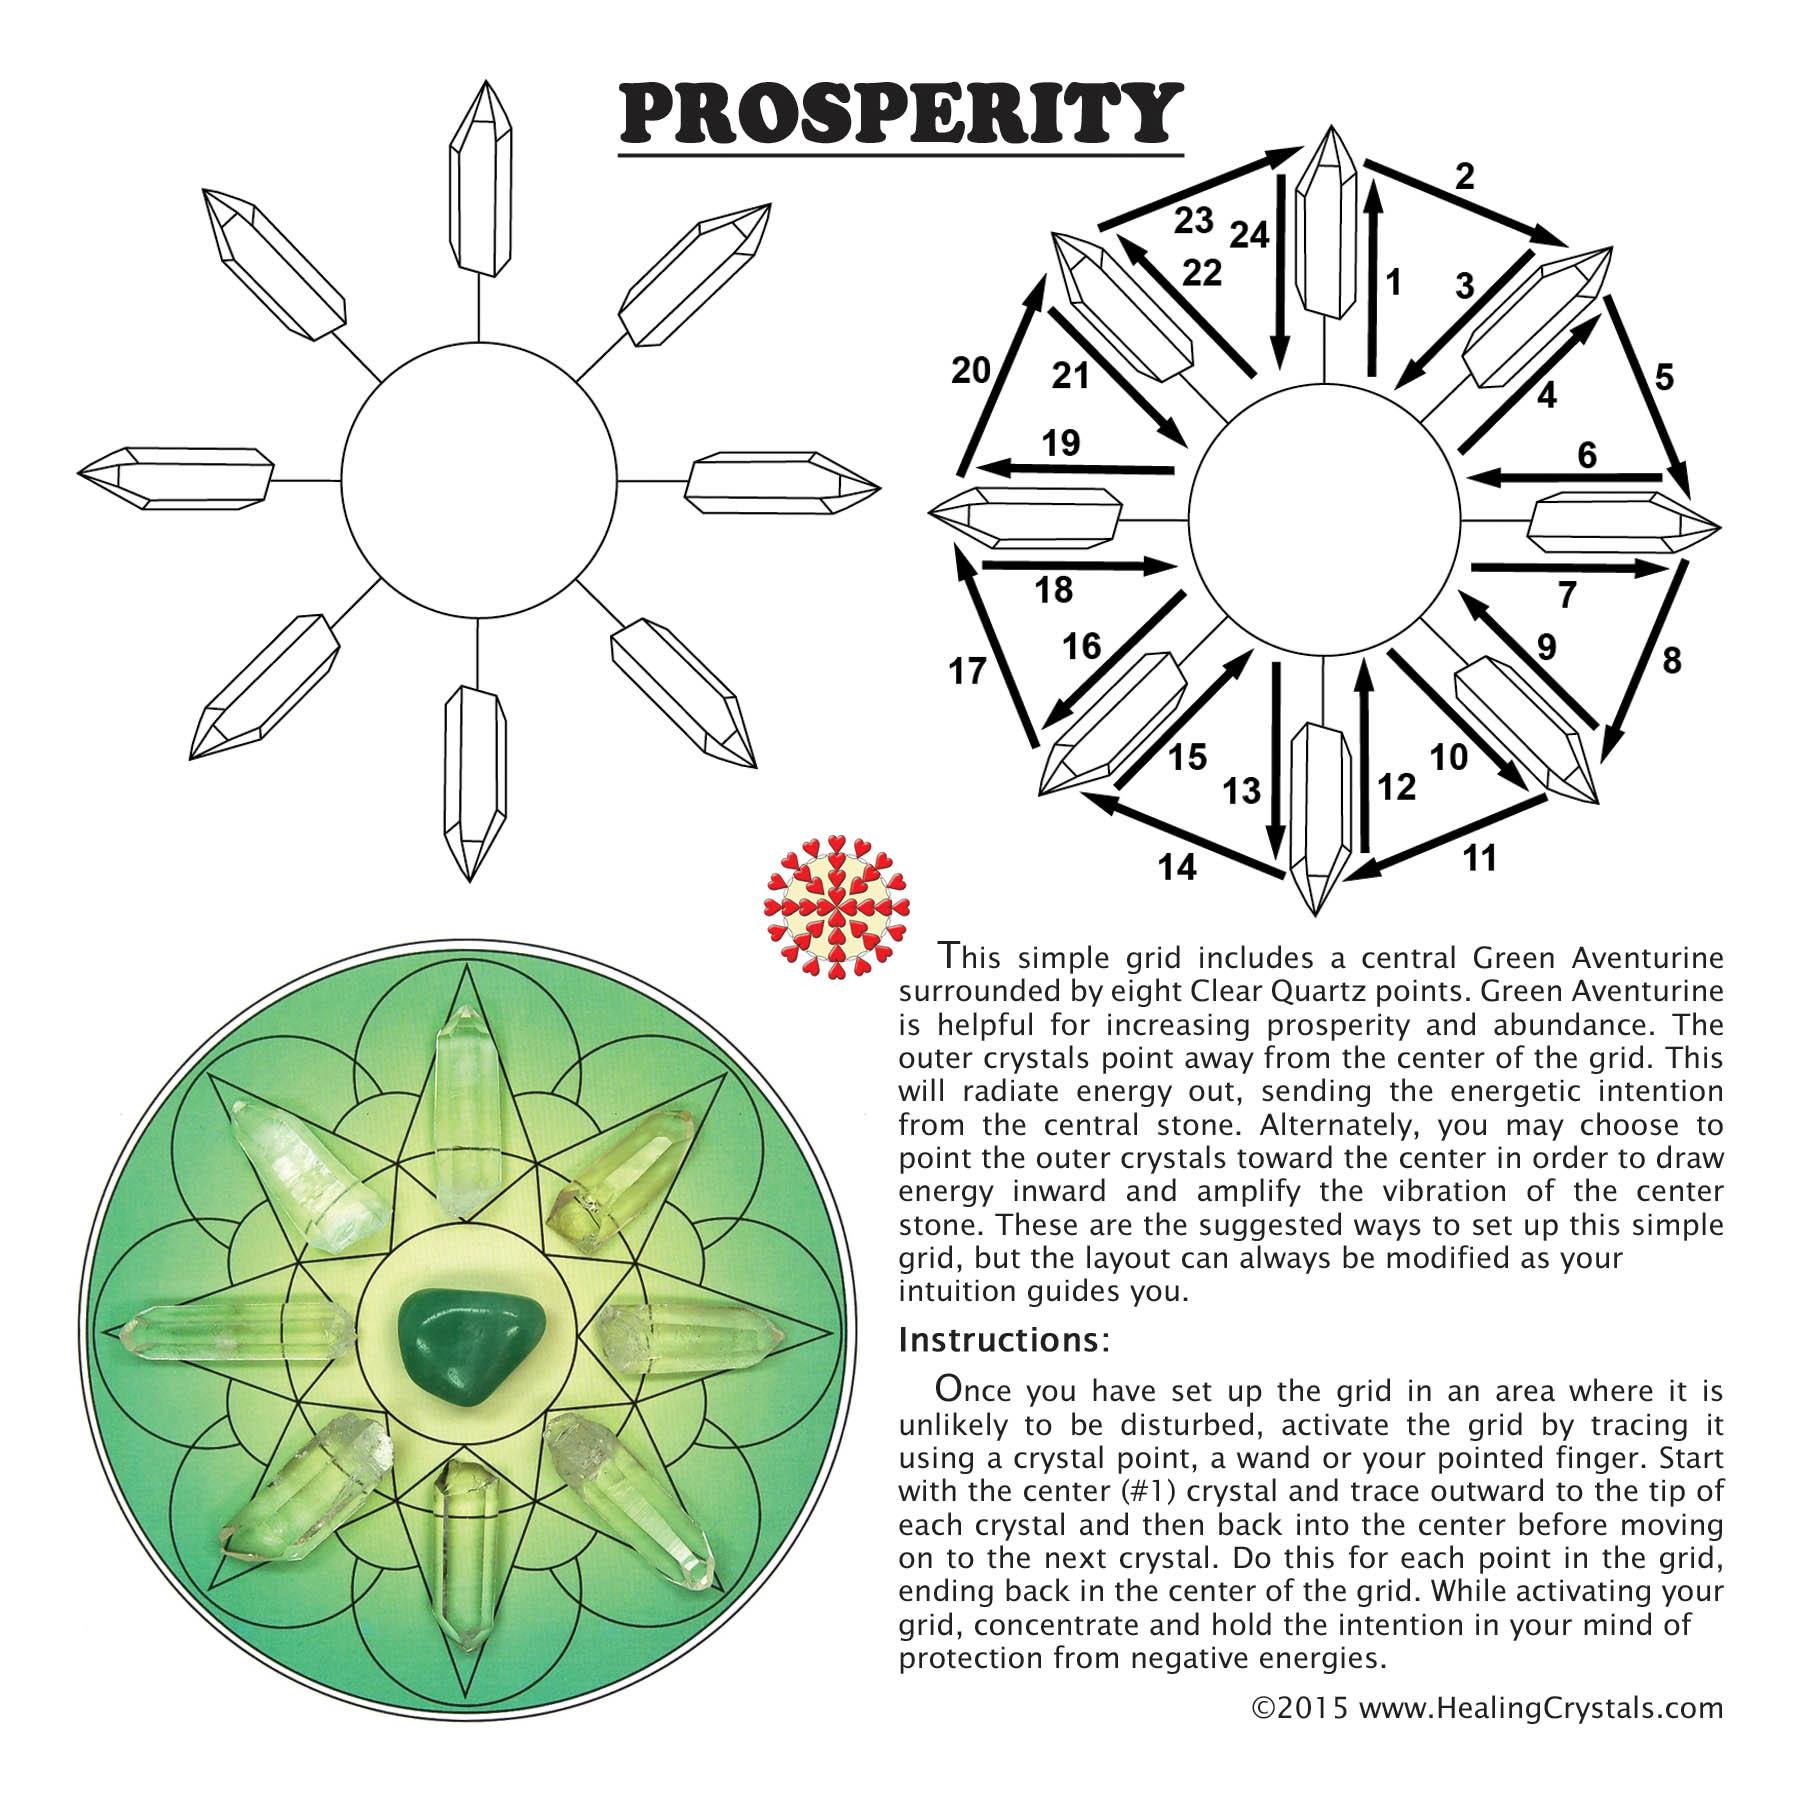 Prosperity Grid Kit with Green Aventurine